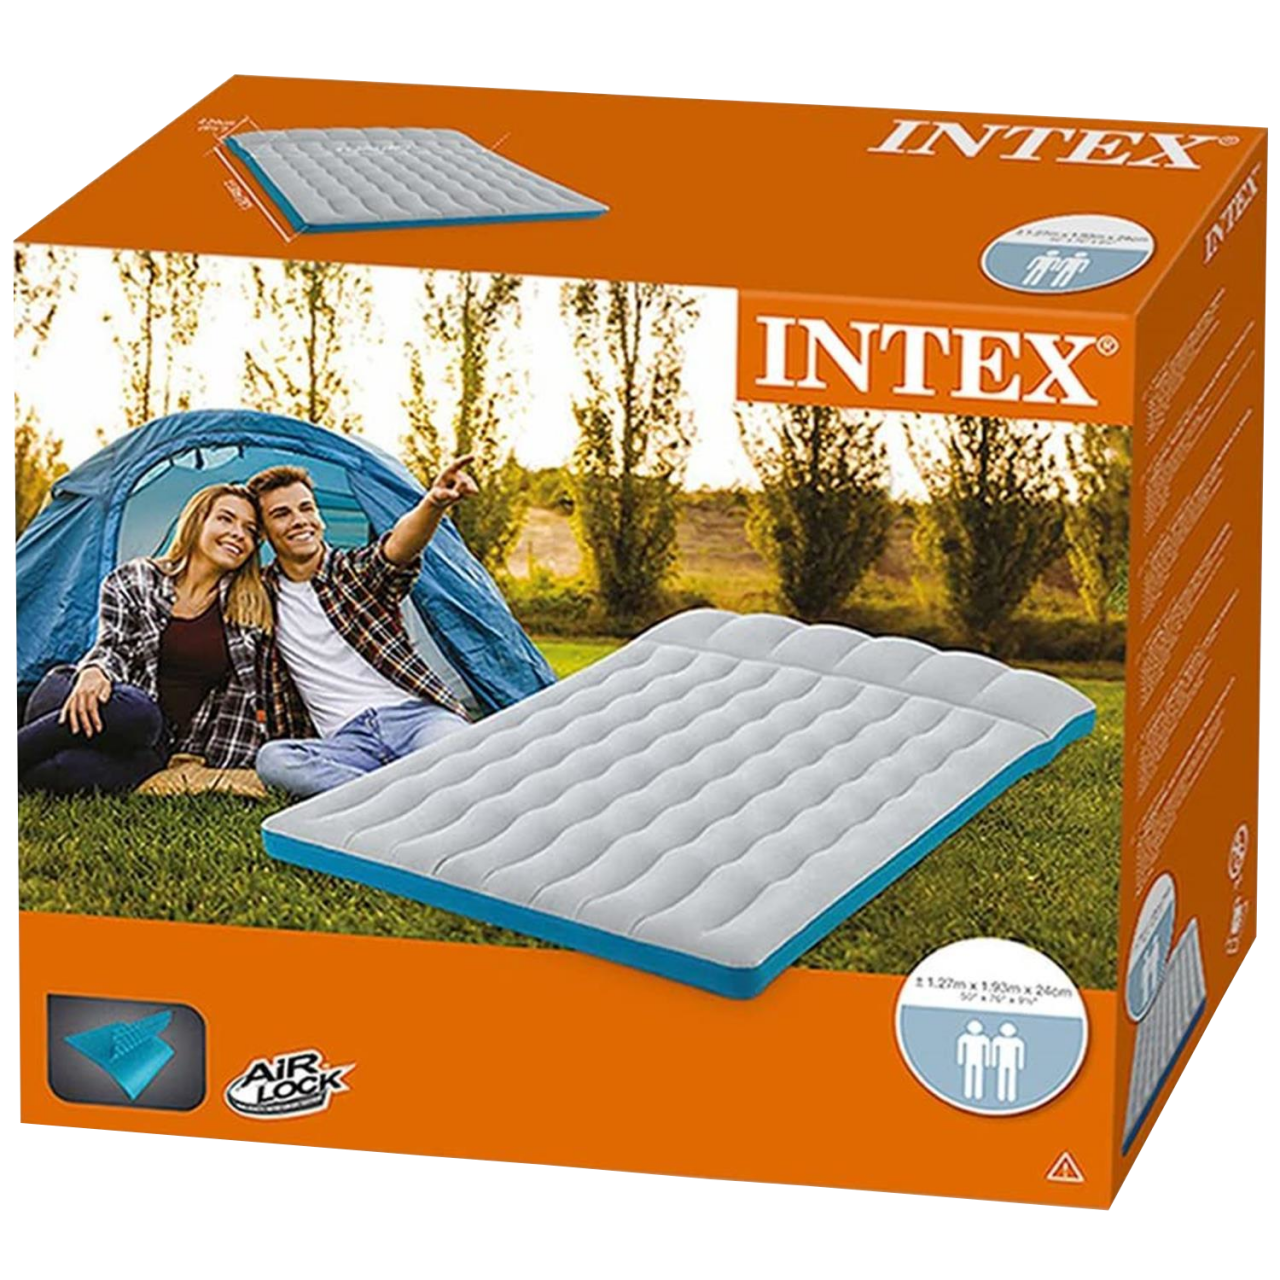 Intex Luftmatratze Doppelbett Camping Luftbett aufblasbar 193x127x24cm 67999